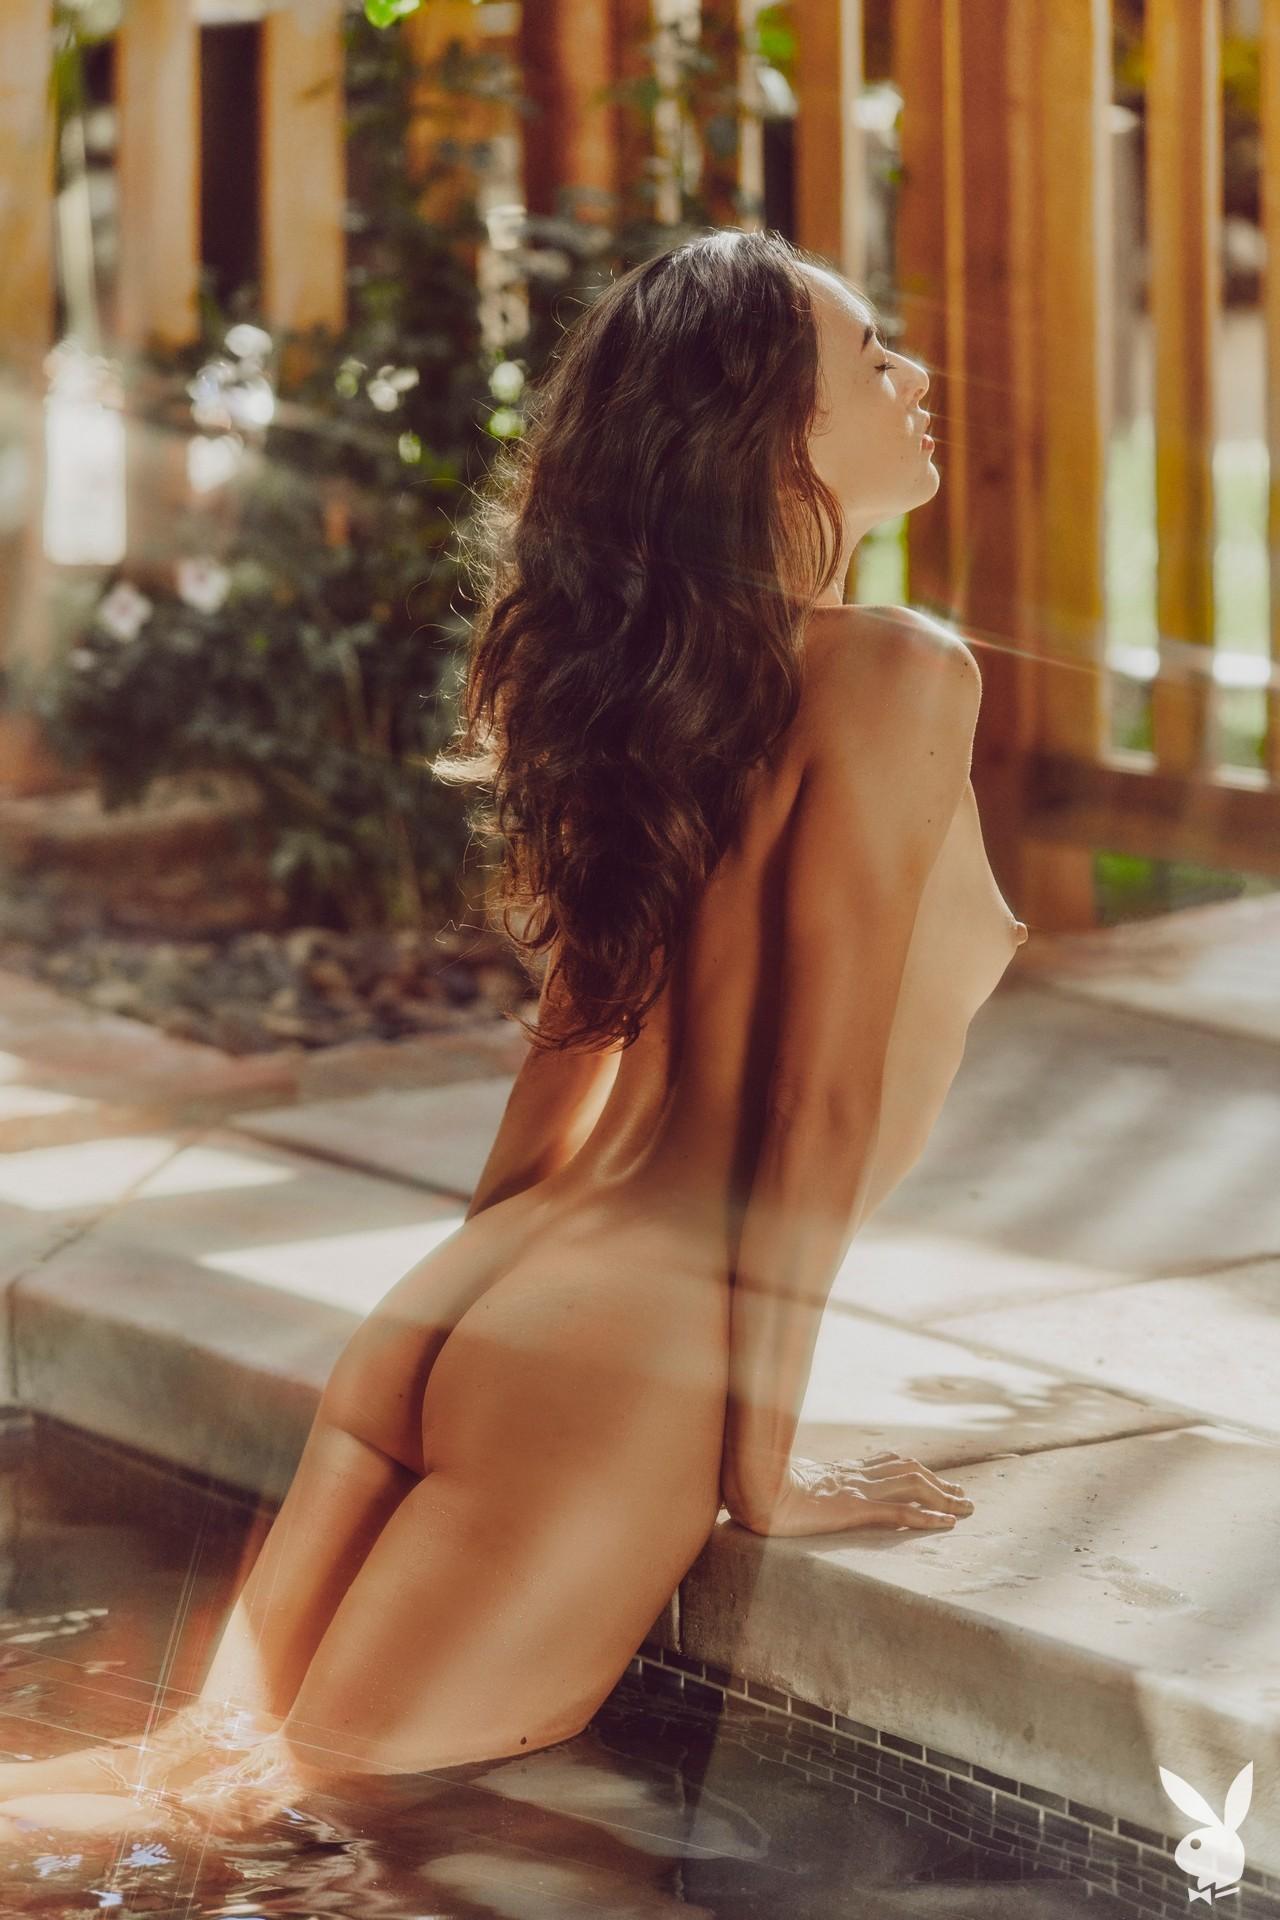 Genevieve Liberte In True To Form Playboy Plus 0026